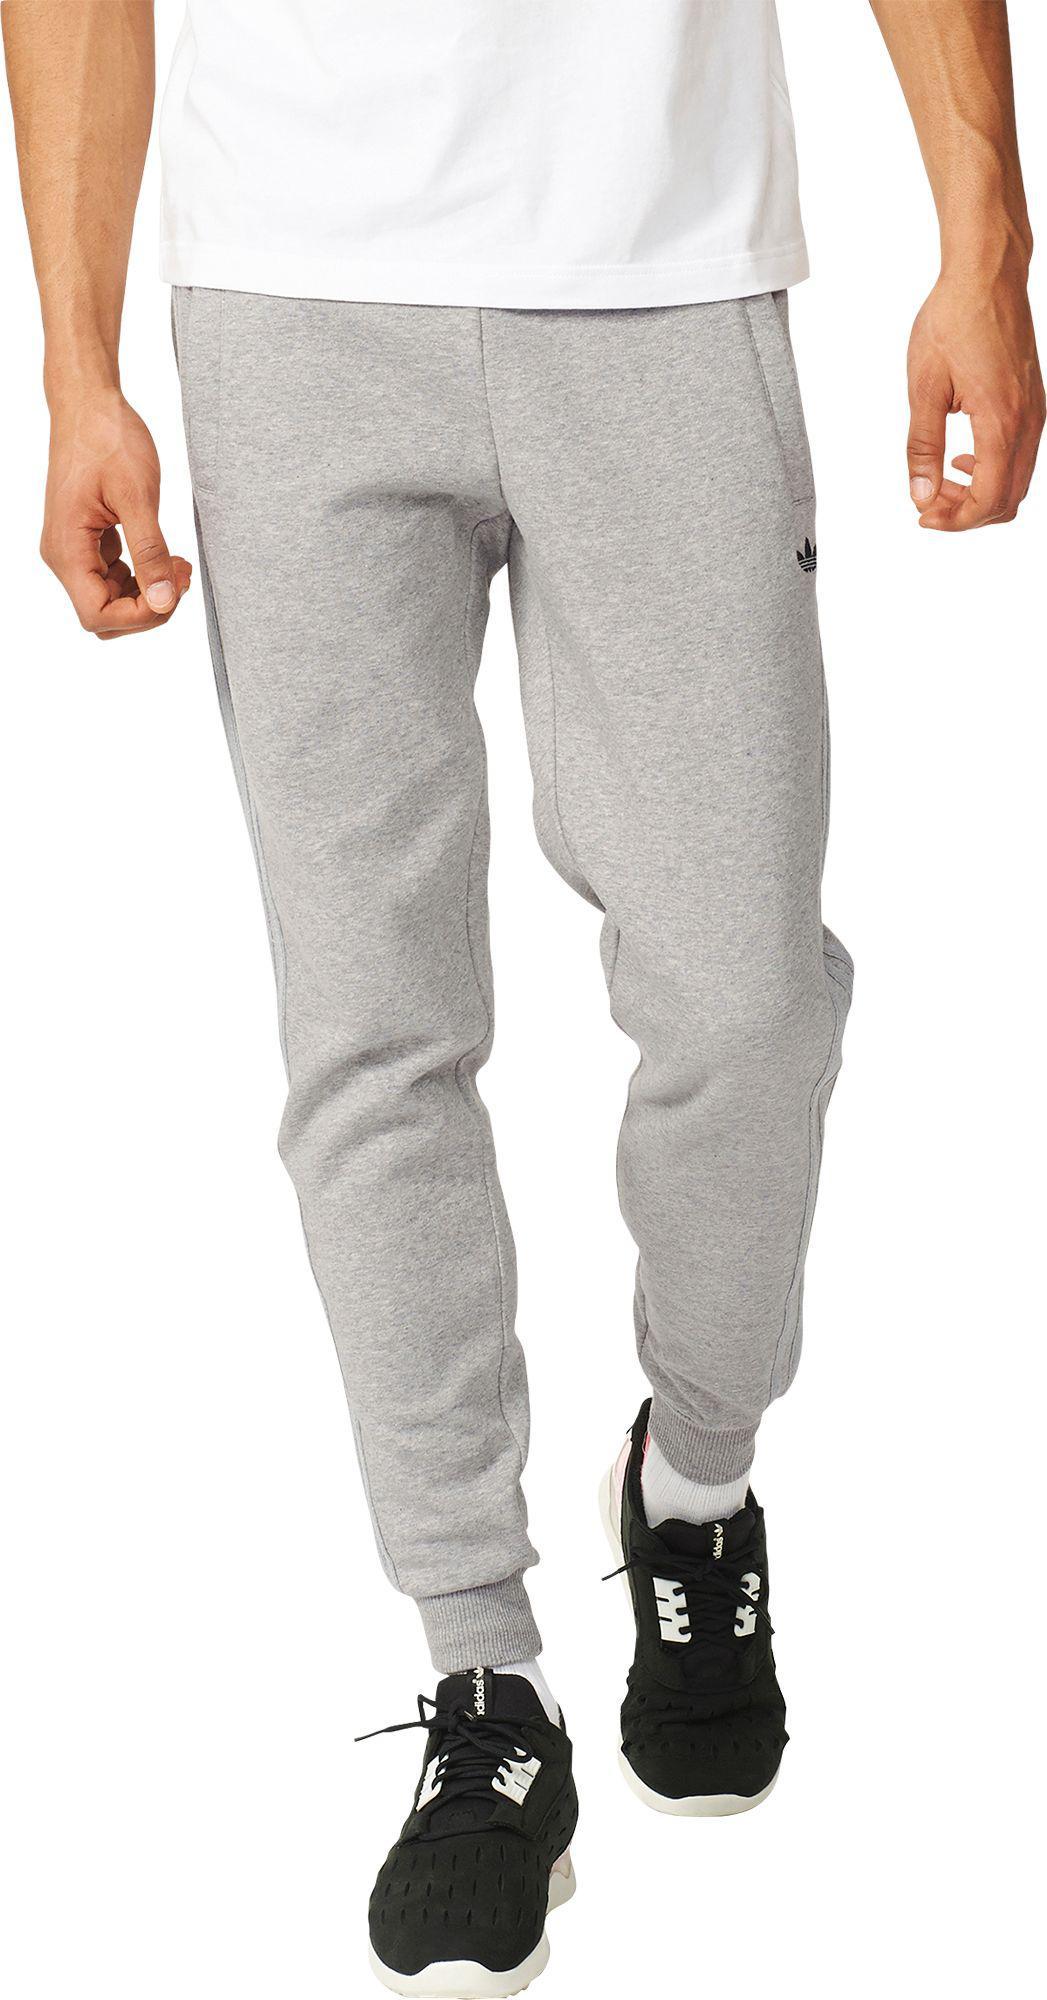 3fac8ae042 Adidas Gray Originals Classic Trefoil Cuffed Sweatpants for men